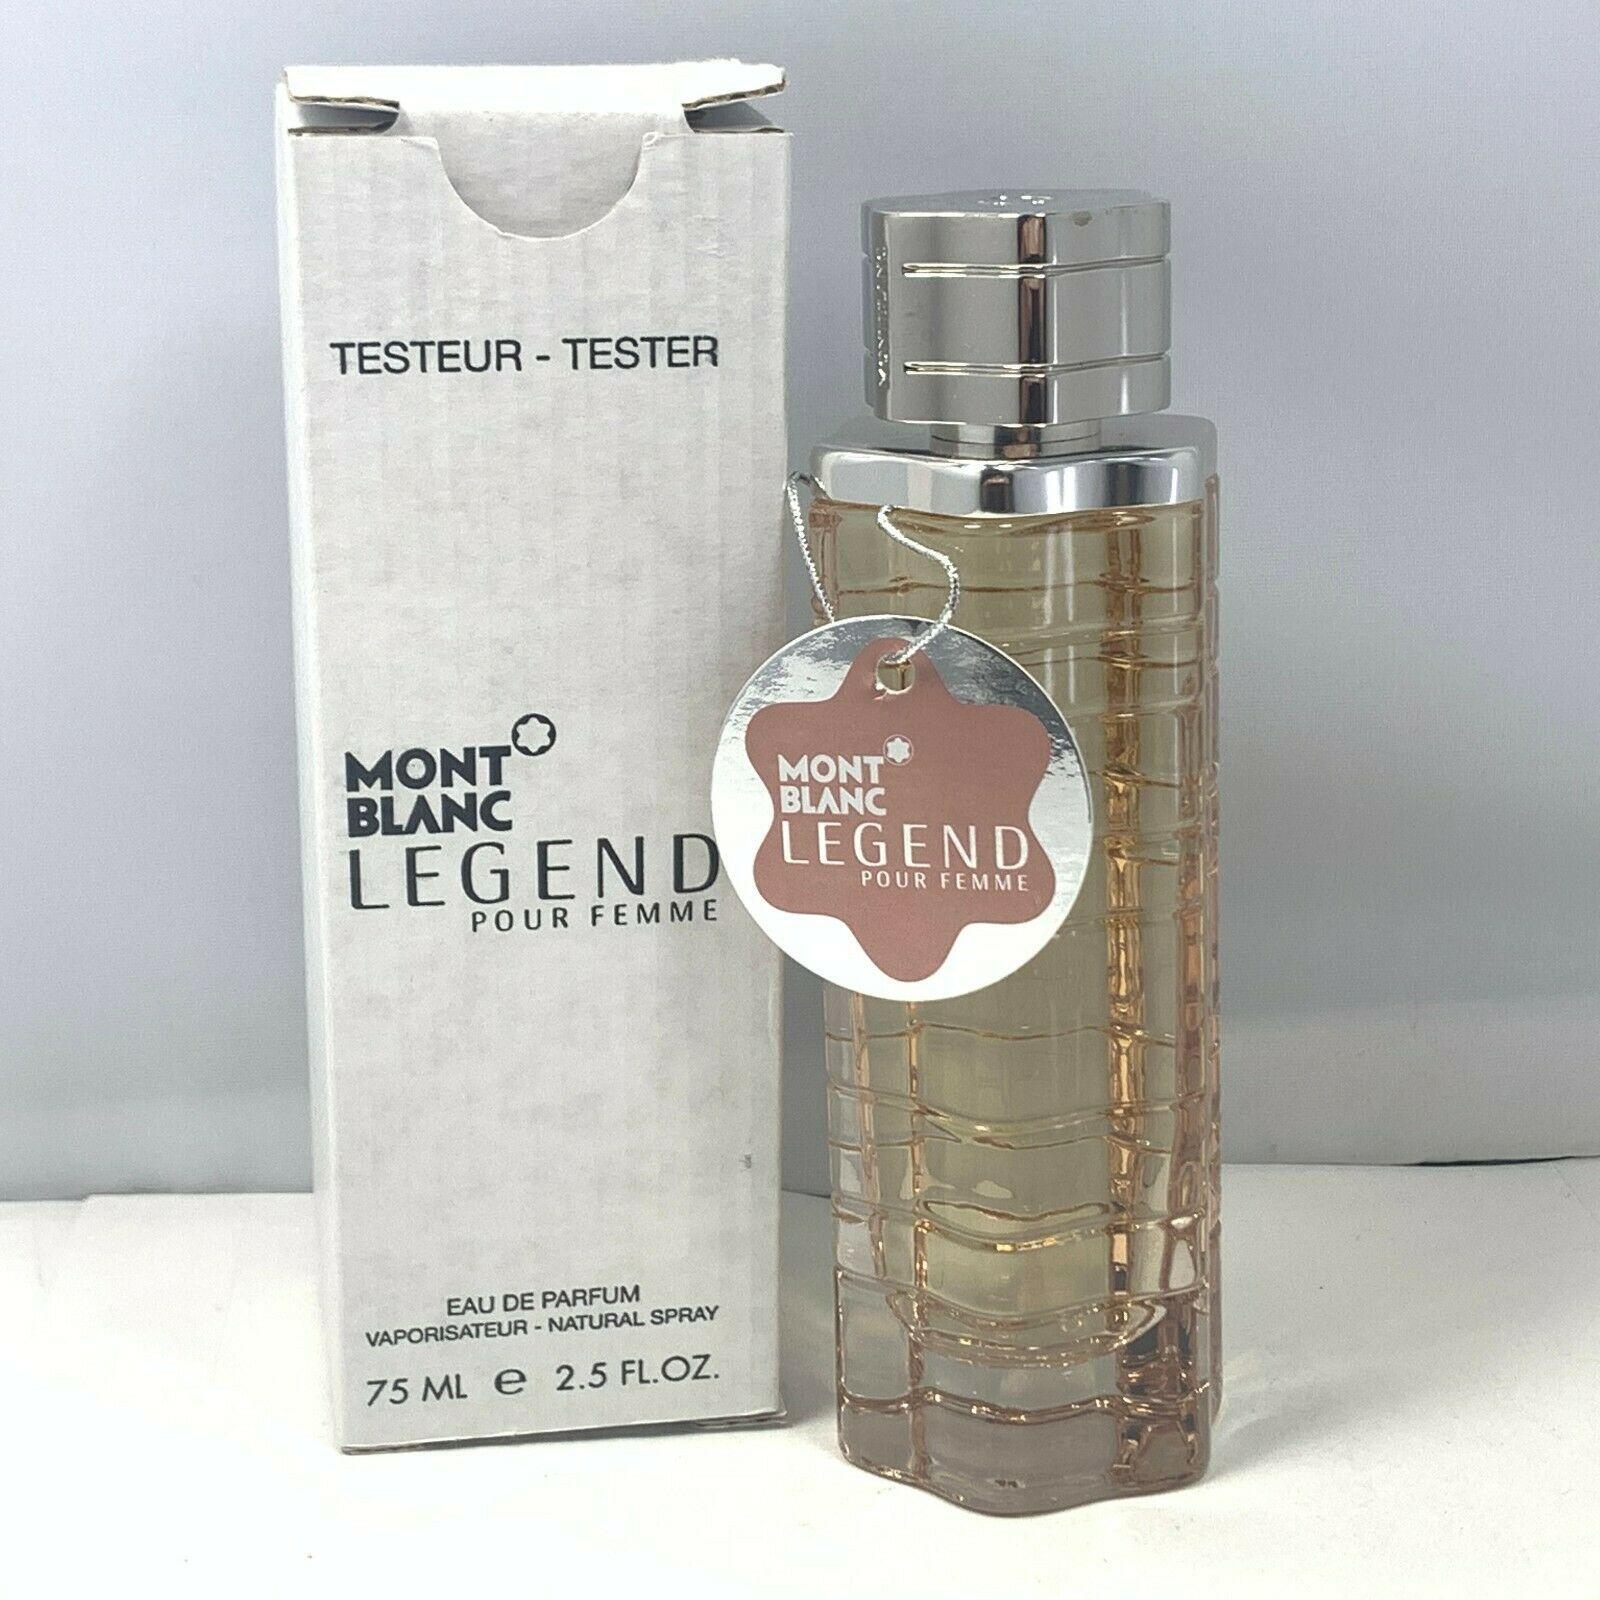 Aaamont blanc legend 2.5 oz tester perfume